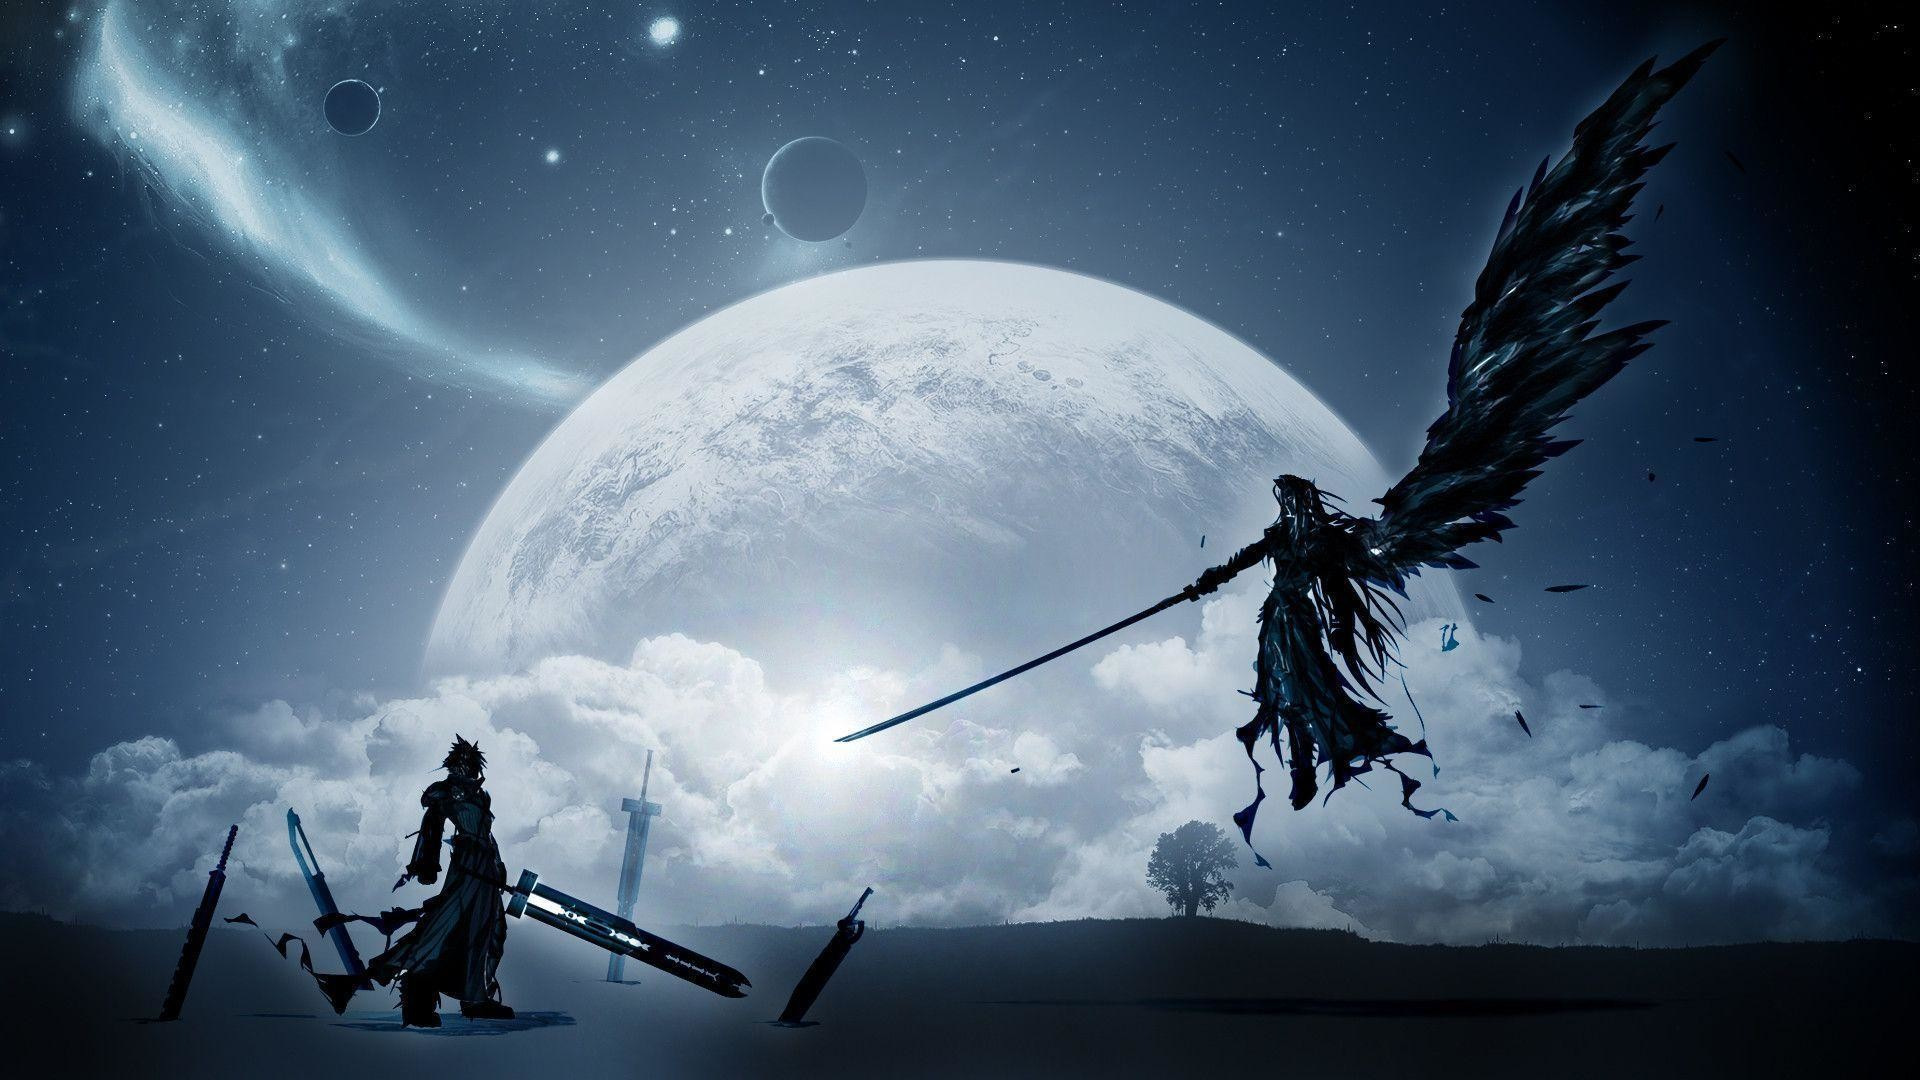 Games Final Fantasy XV Wallpaper   Queenwallpaper.